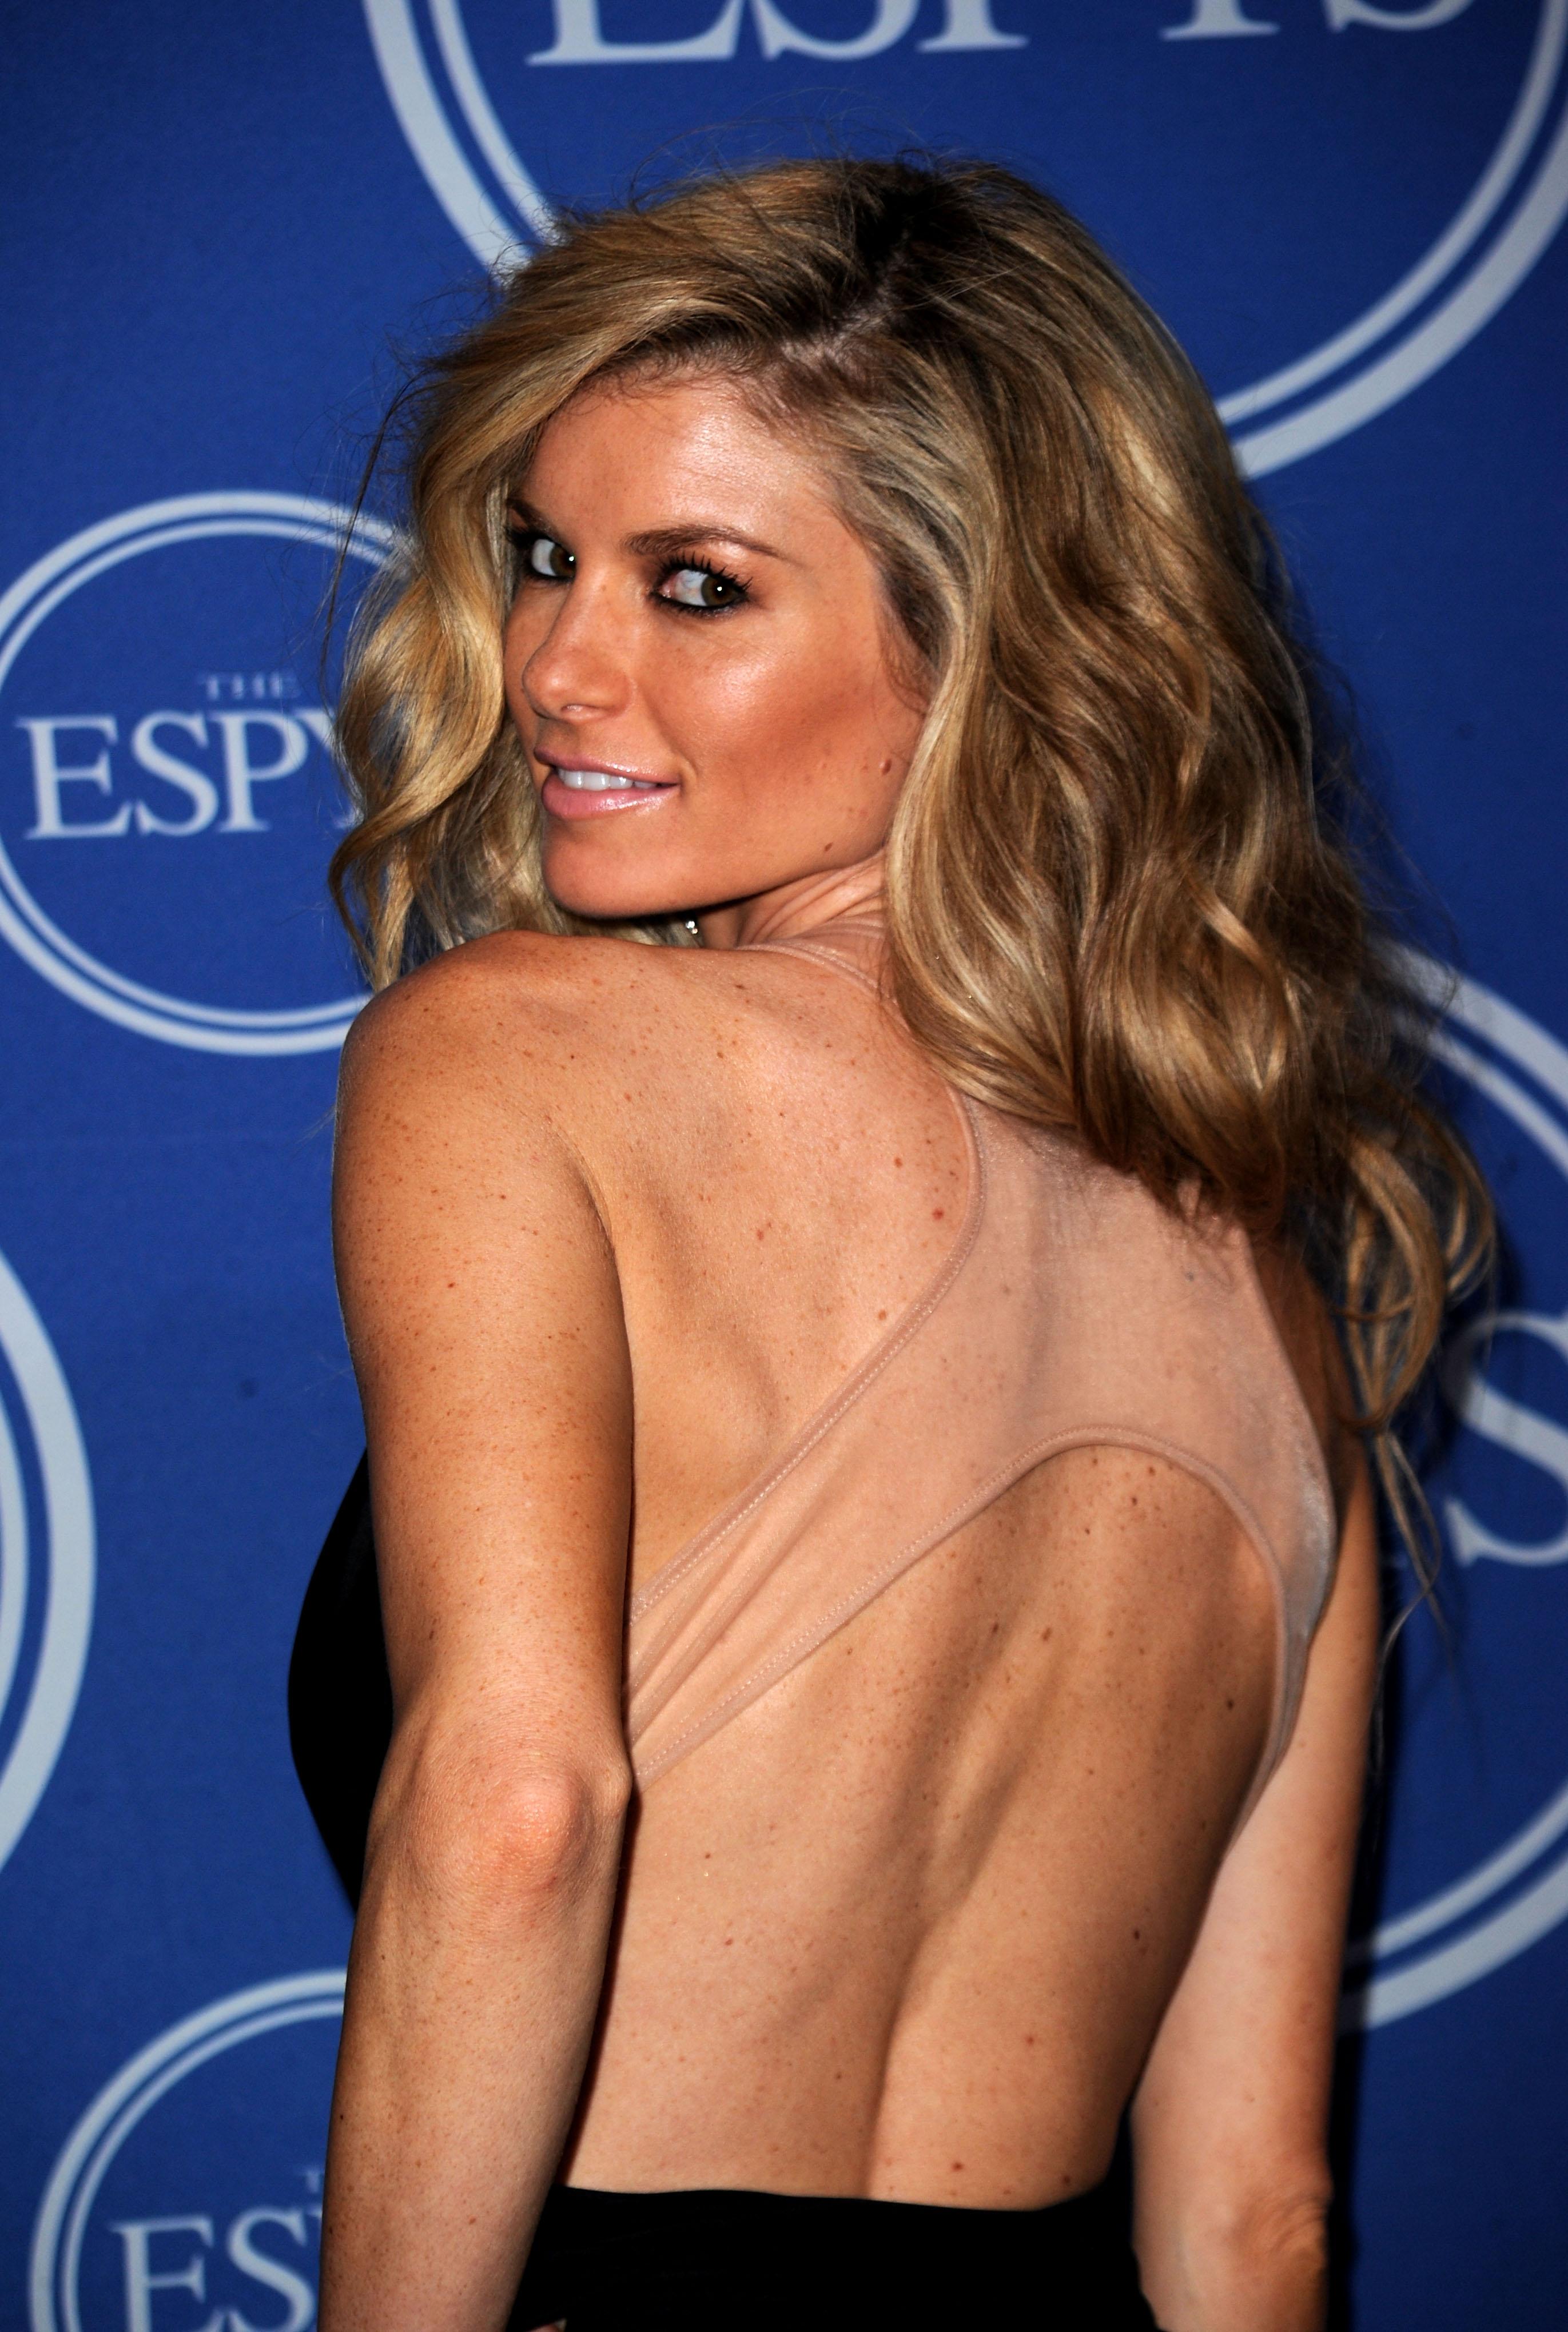 00493_Marisa_Miller_ESPY_Awards_8_122_34lo.jpg